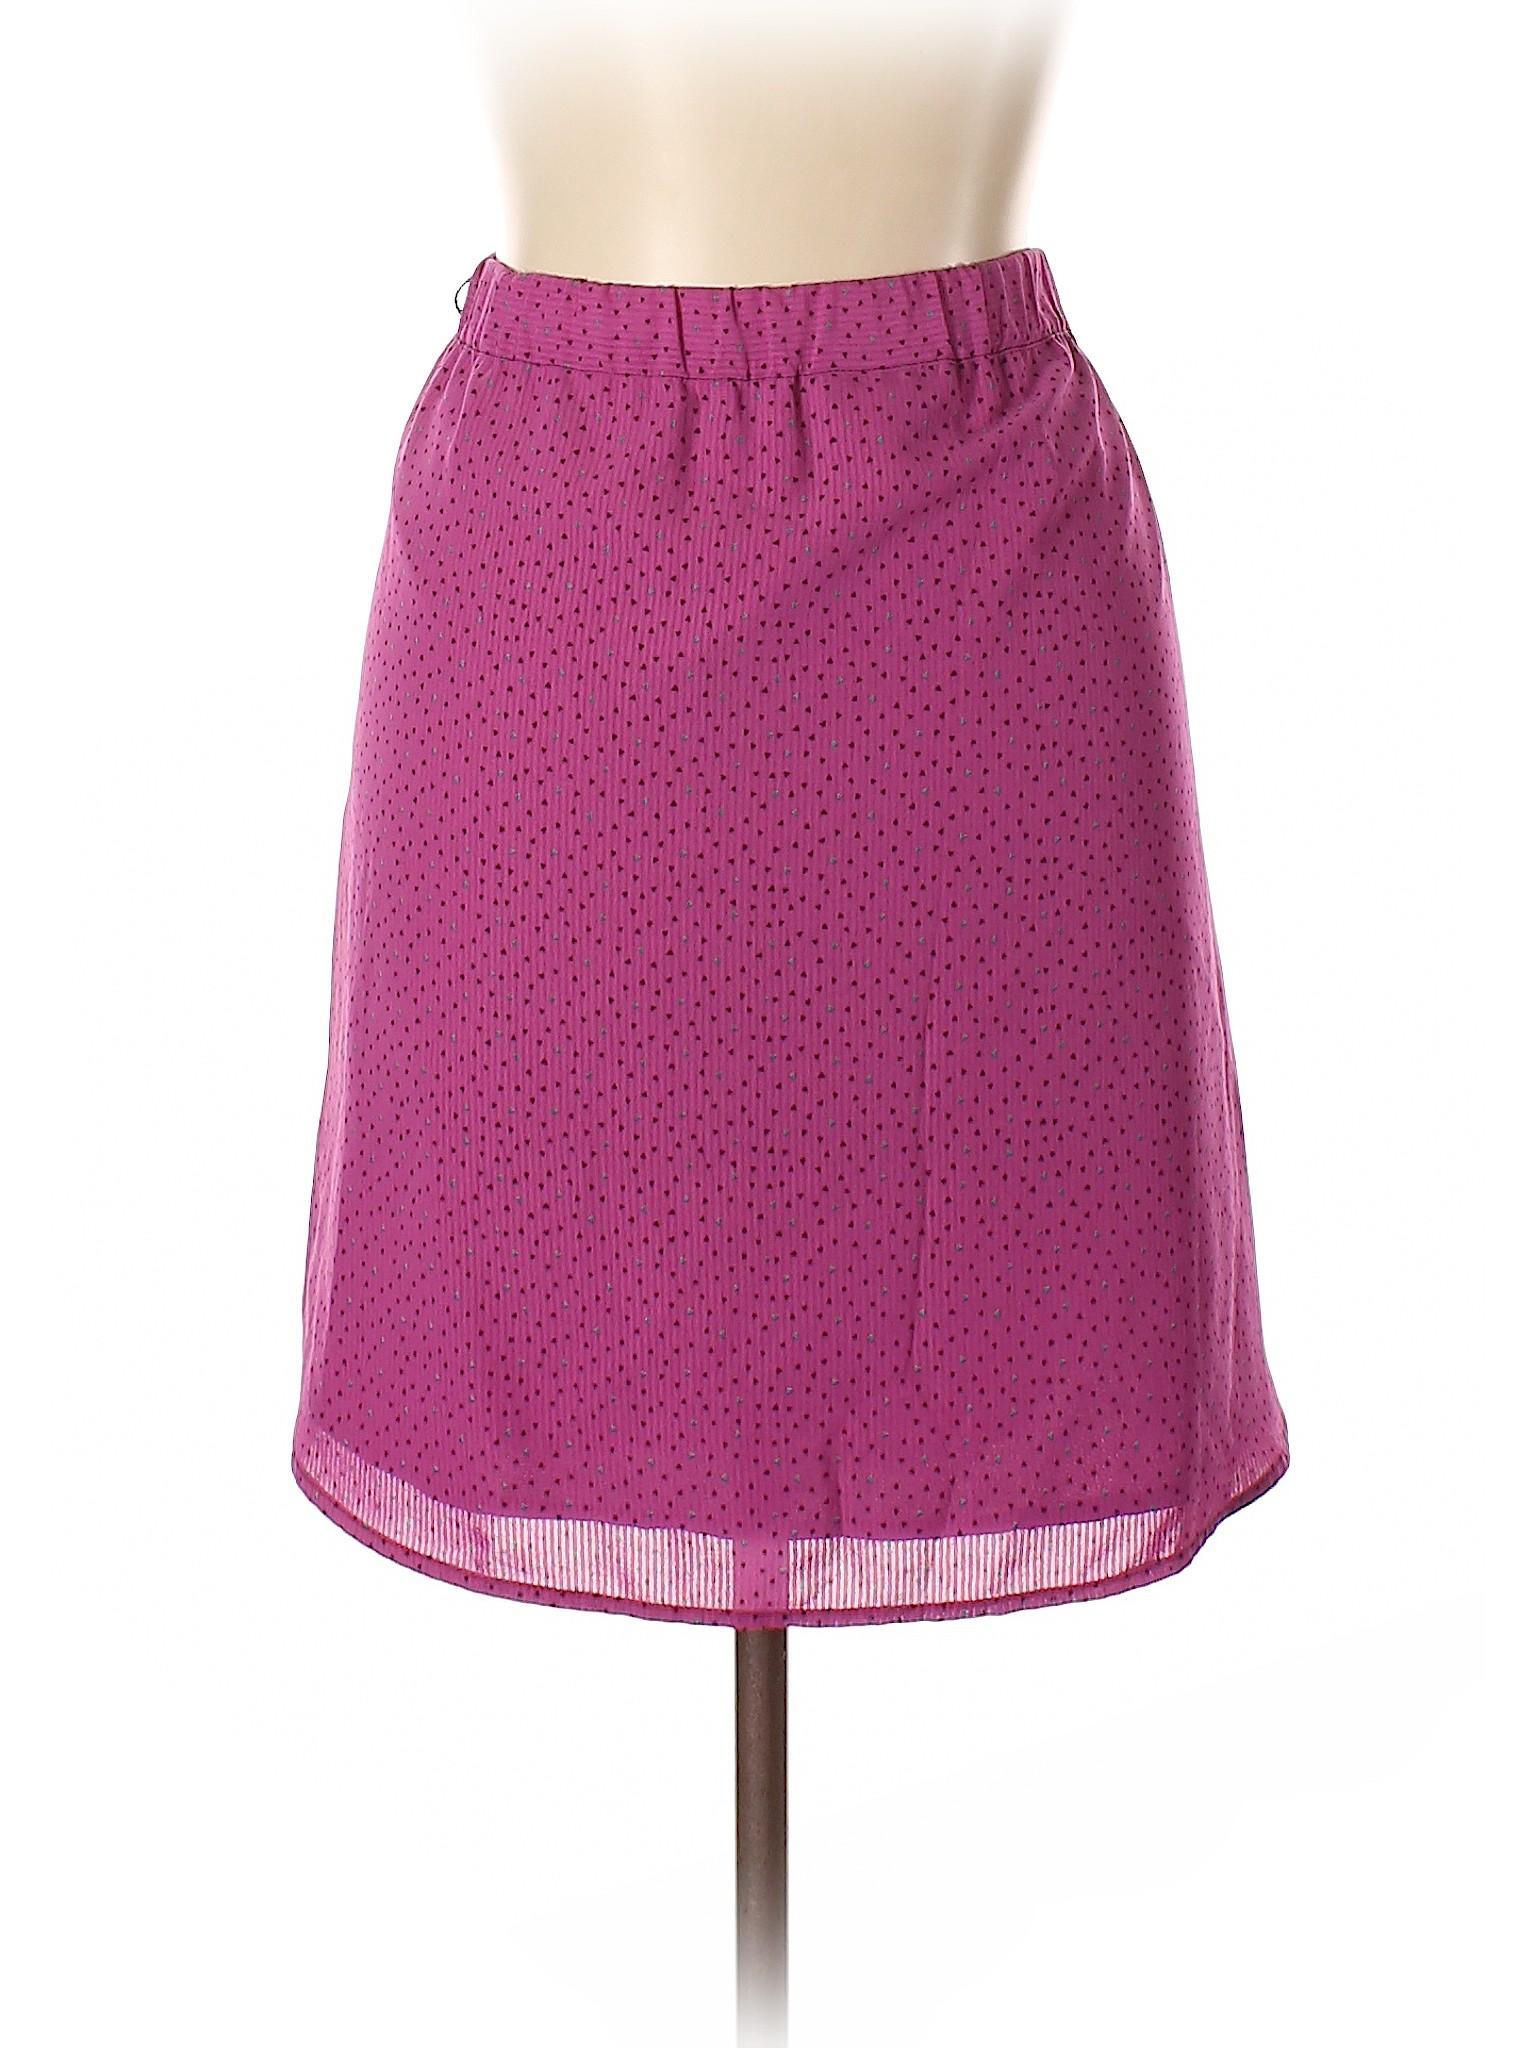 Boutique I Casual Ronson Skirt Heart leisure w8xSqfa